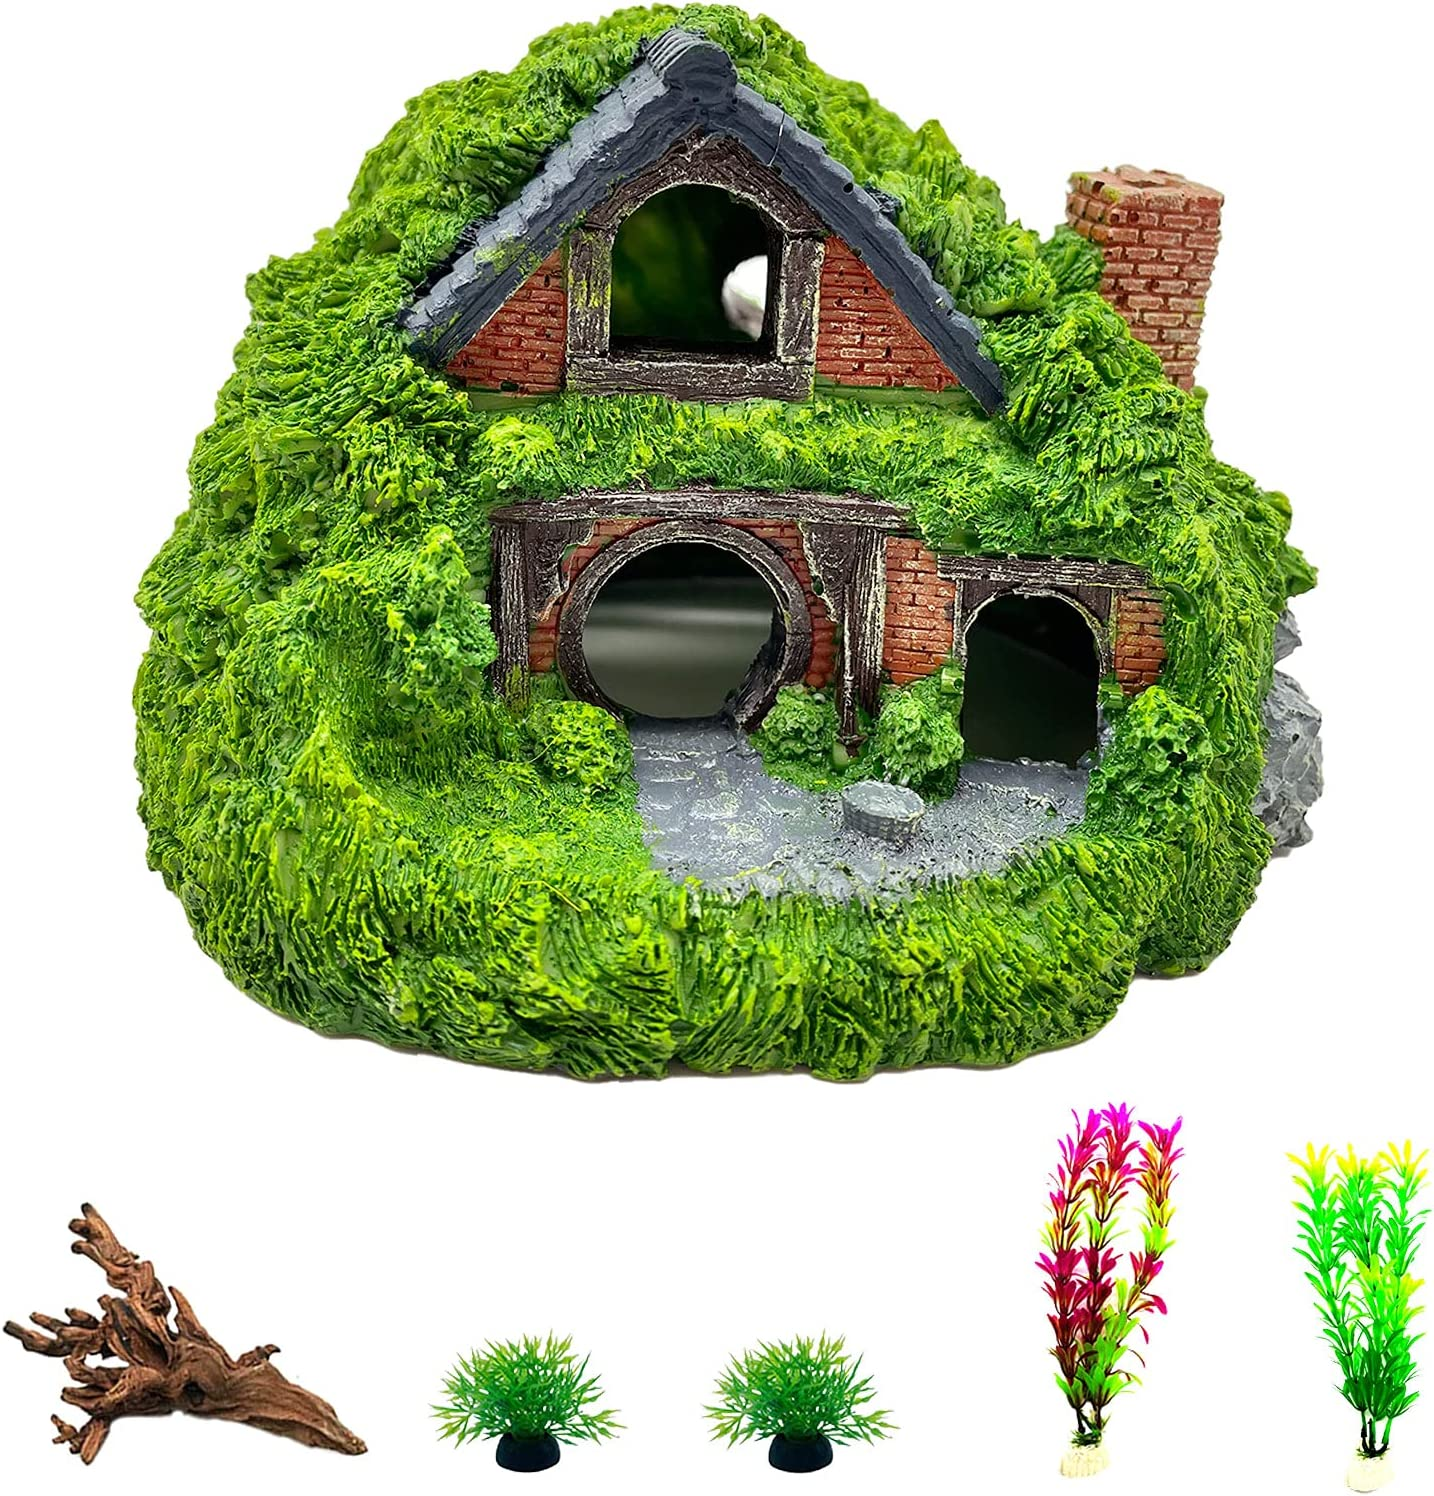 Tfwadmx Aquarium Decoration Hobbit House Resin Betta Hideout Cave Reptile Hiding Hollow Hole Shelter Fish Tank Hut Ornaments Driftwood Rockery Landscaping Plants Supplies Accessories(6 Pcs)